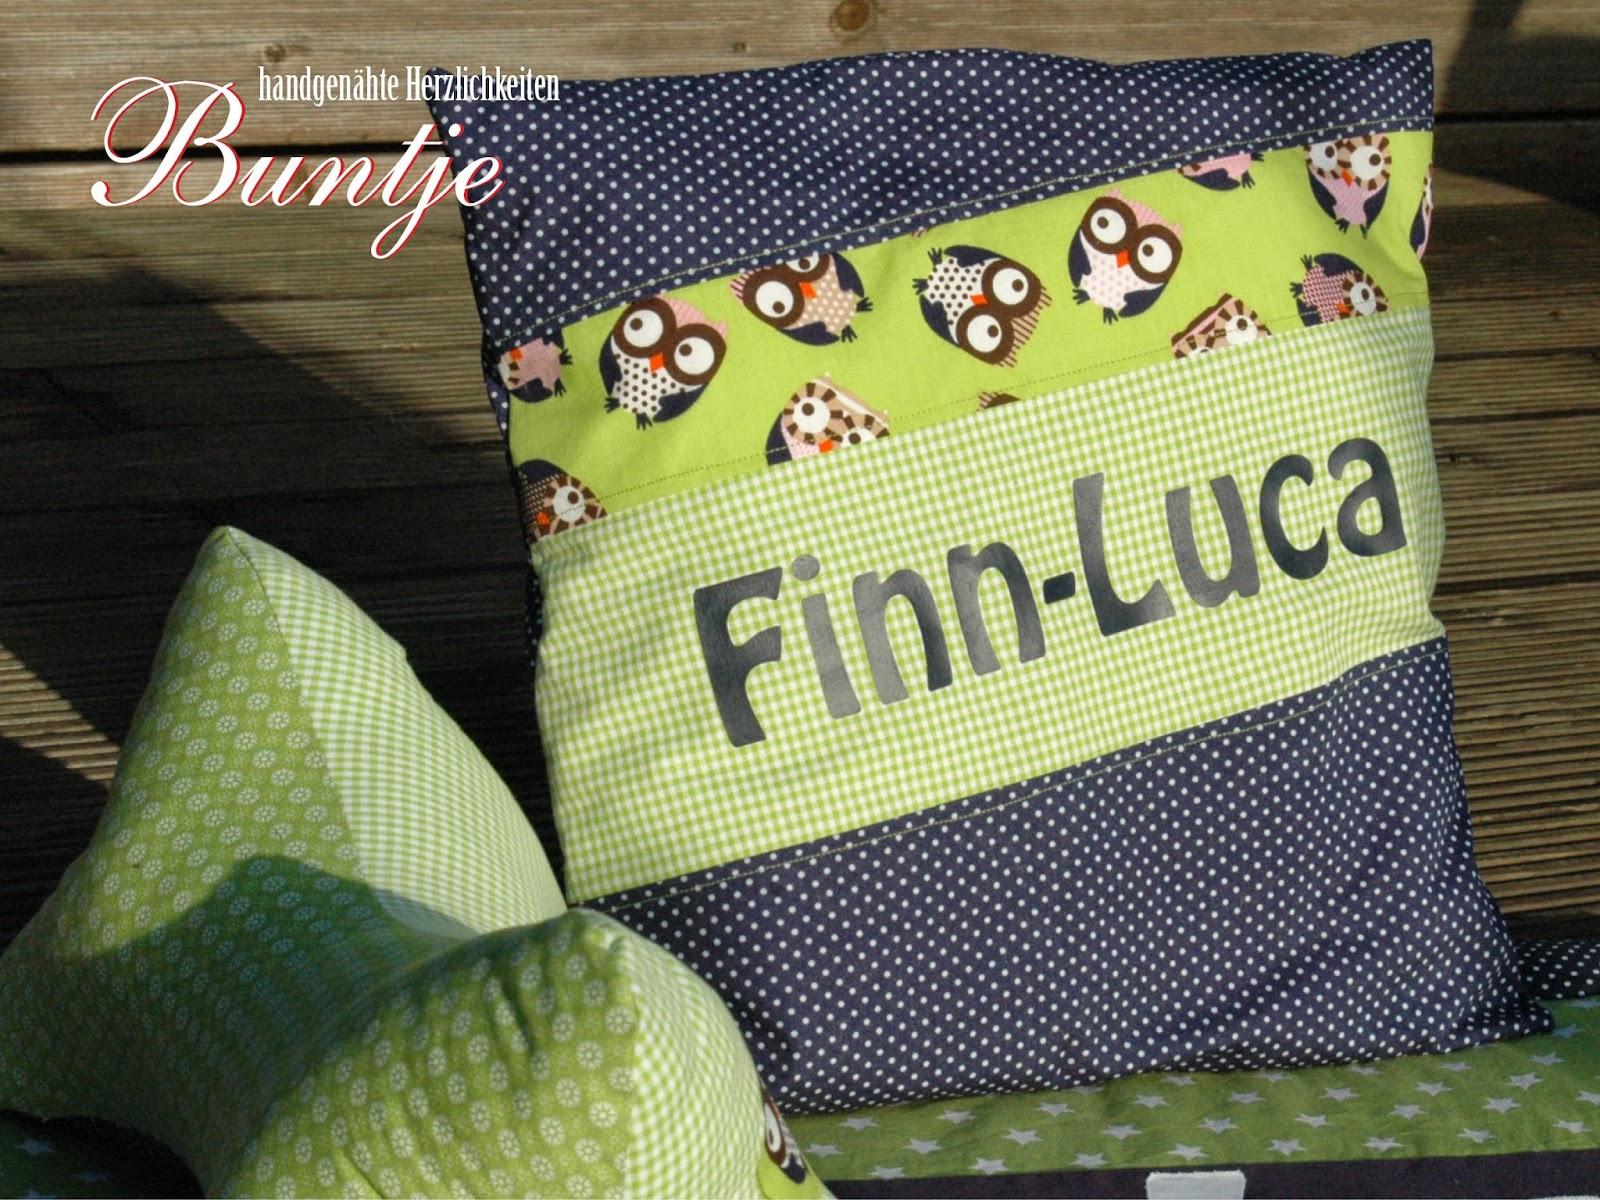 Namenskissen Kissen Name Geschenk Kind Baby Geburt Taufe 1. Geburtstag Baumwolle Junge blau grün Eulen Finn-Luca handmade nähen Buntje